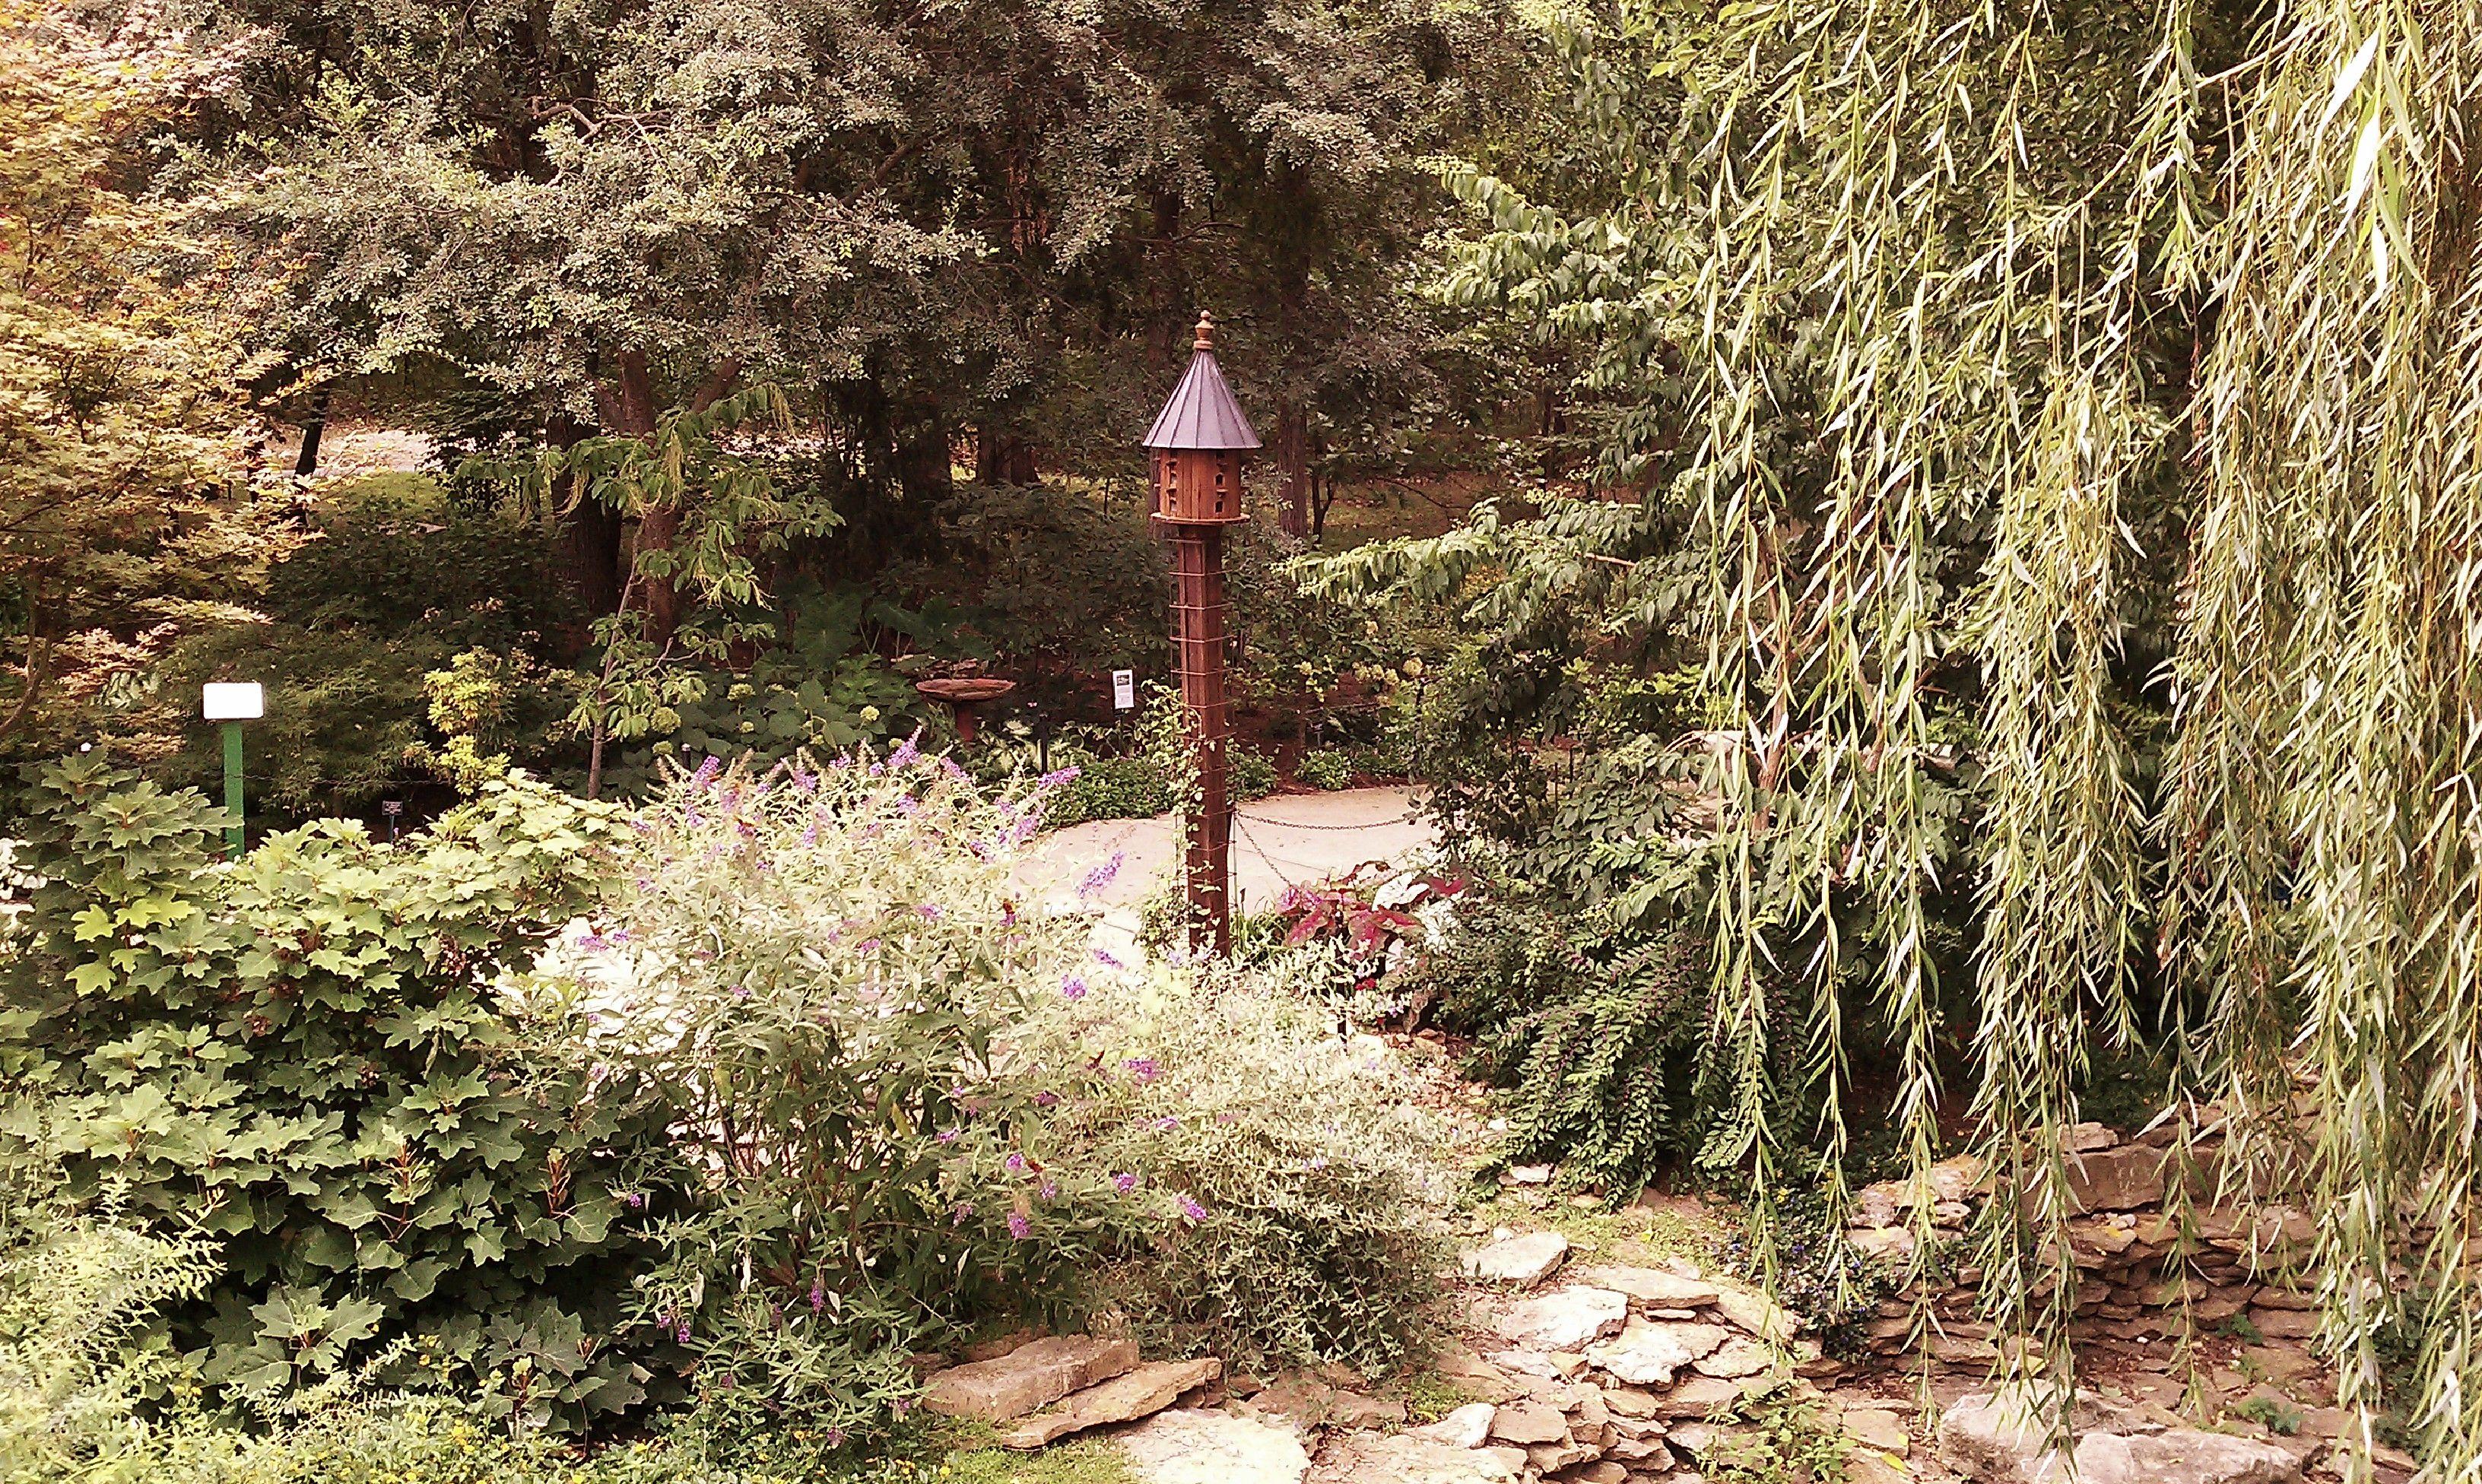 Overland Park Arboretum Holiday Luminary Walk. | Arboretum and ...